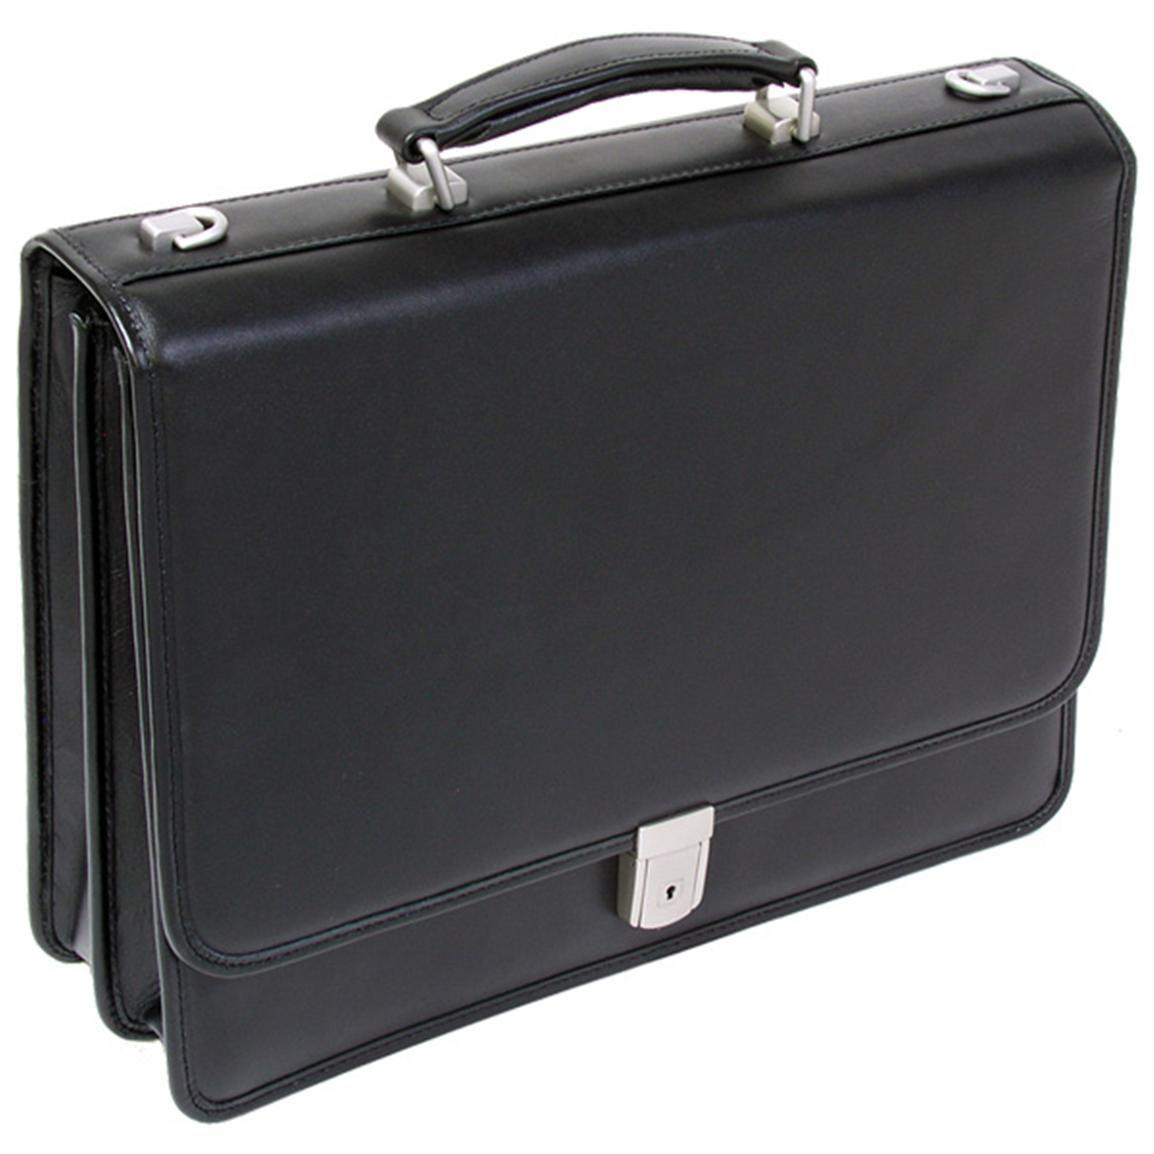 Mcklein Usa V Series Lexington Leather Double Compartment Briefcase Black